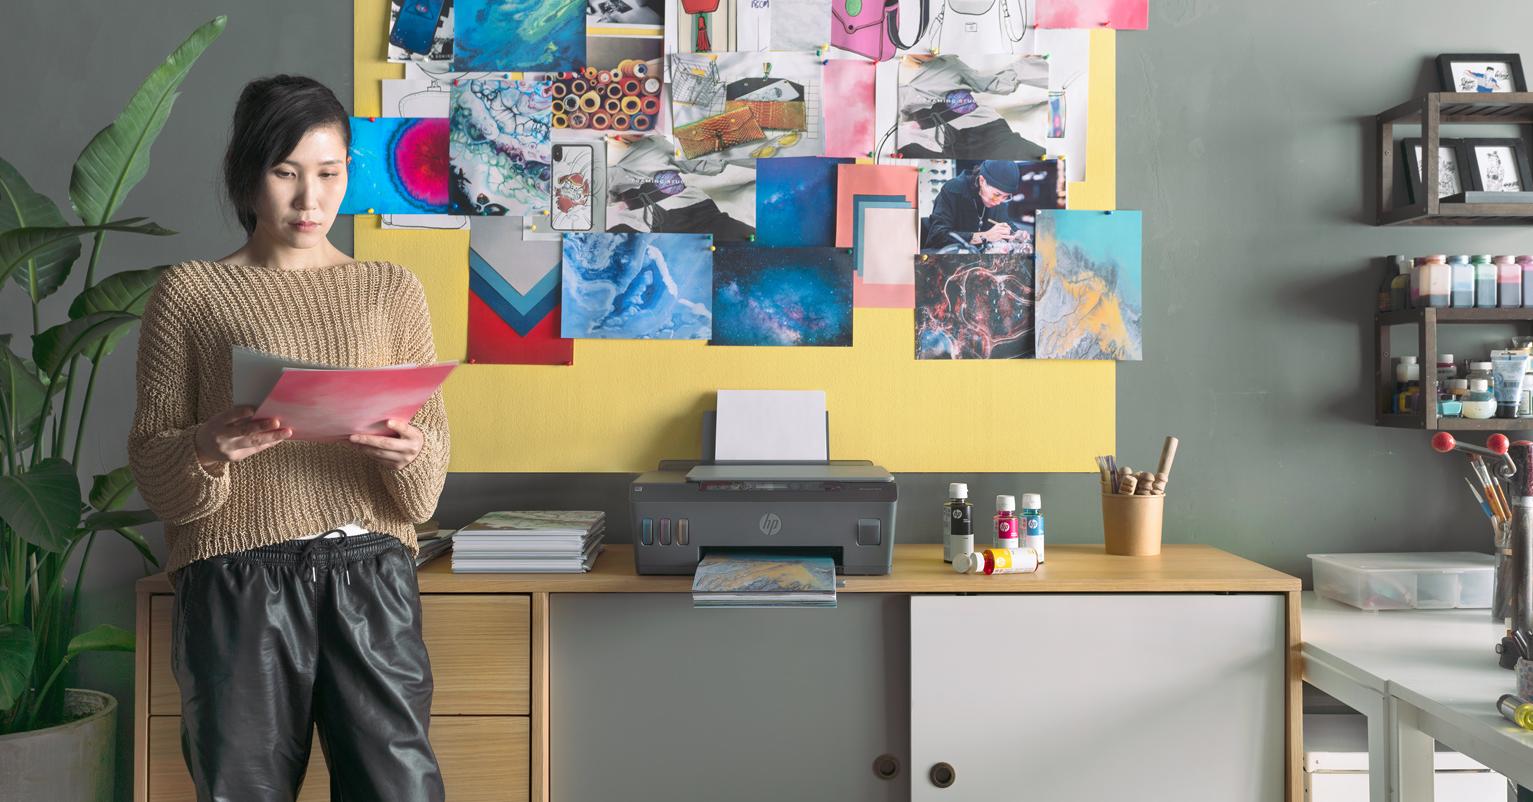 , Hewlett-Packard, Printer, HP Smart Tank Wireless 455, Toner, Ink cartridge, Laser printing, Ink, Printing, World, room, Room, Interior design, Furniture, Fashion design, Design, Textile, Desk, Art, Visual arts, Wallpaper